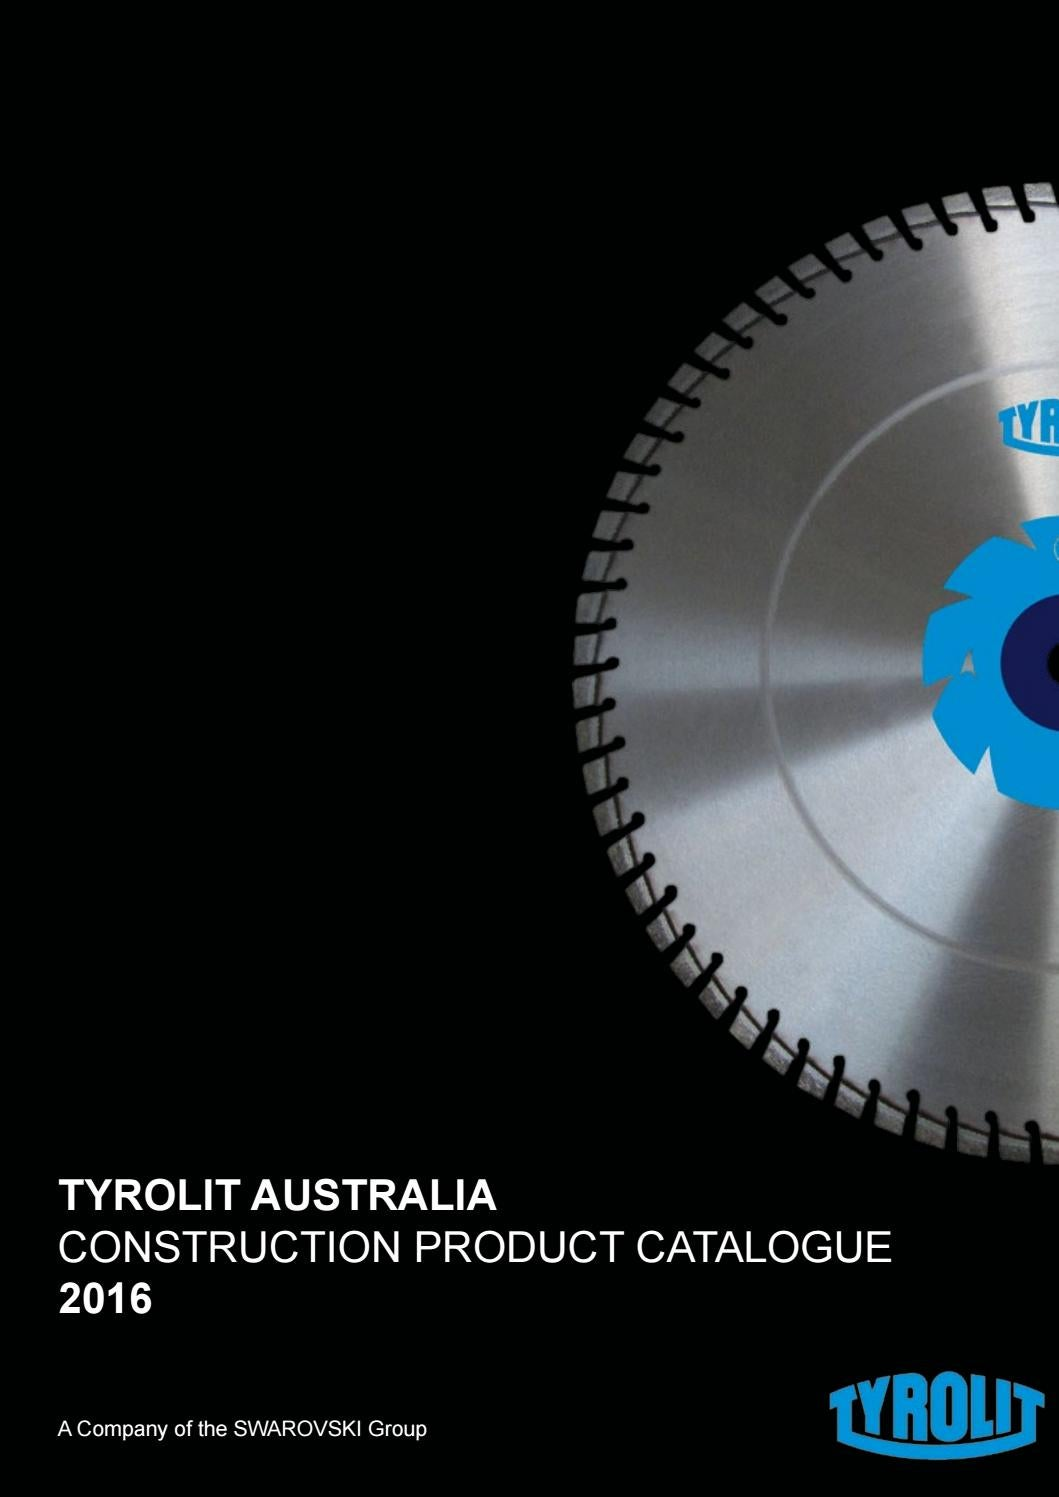 TYROLIT Australia Catalogue 2016 By Tyrolit Australia Issuu